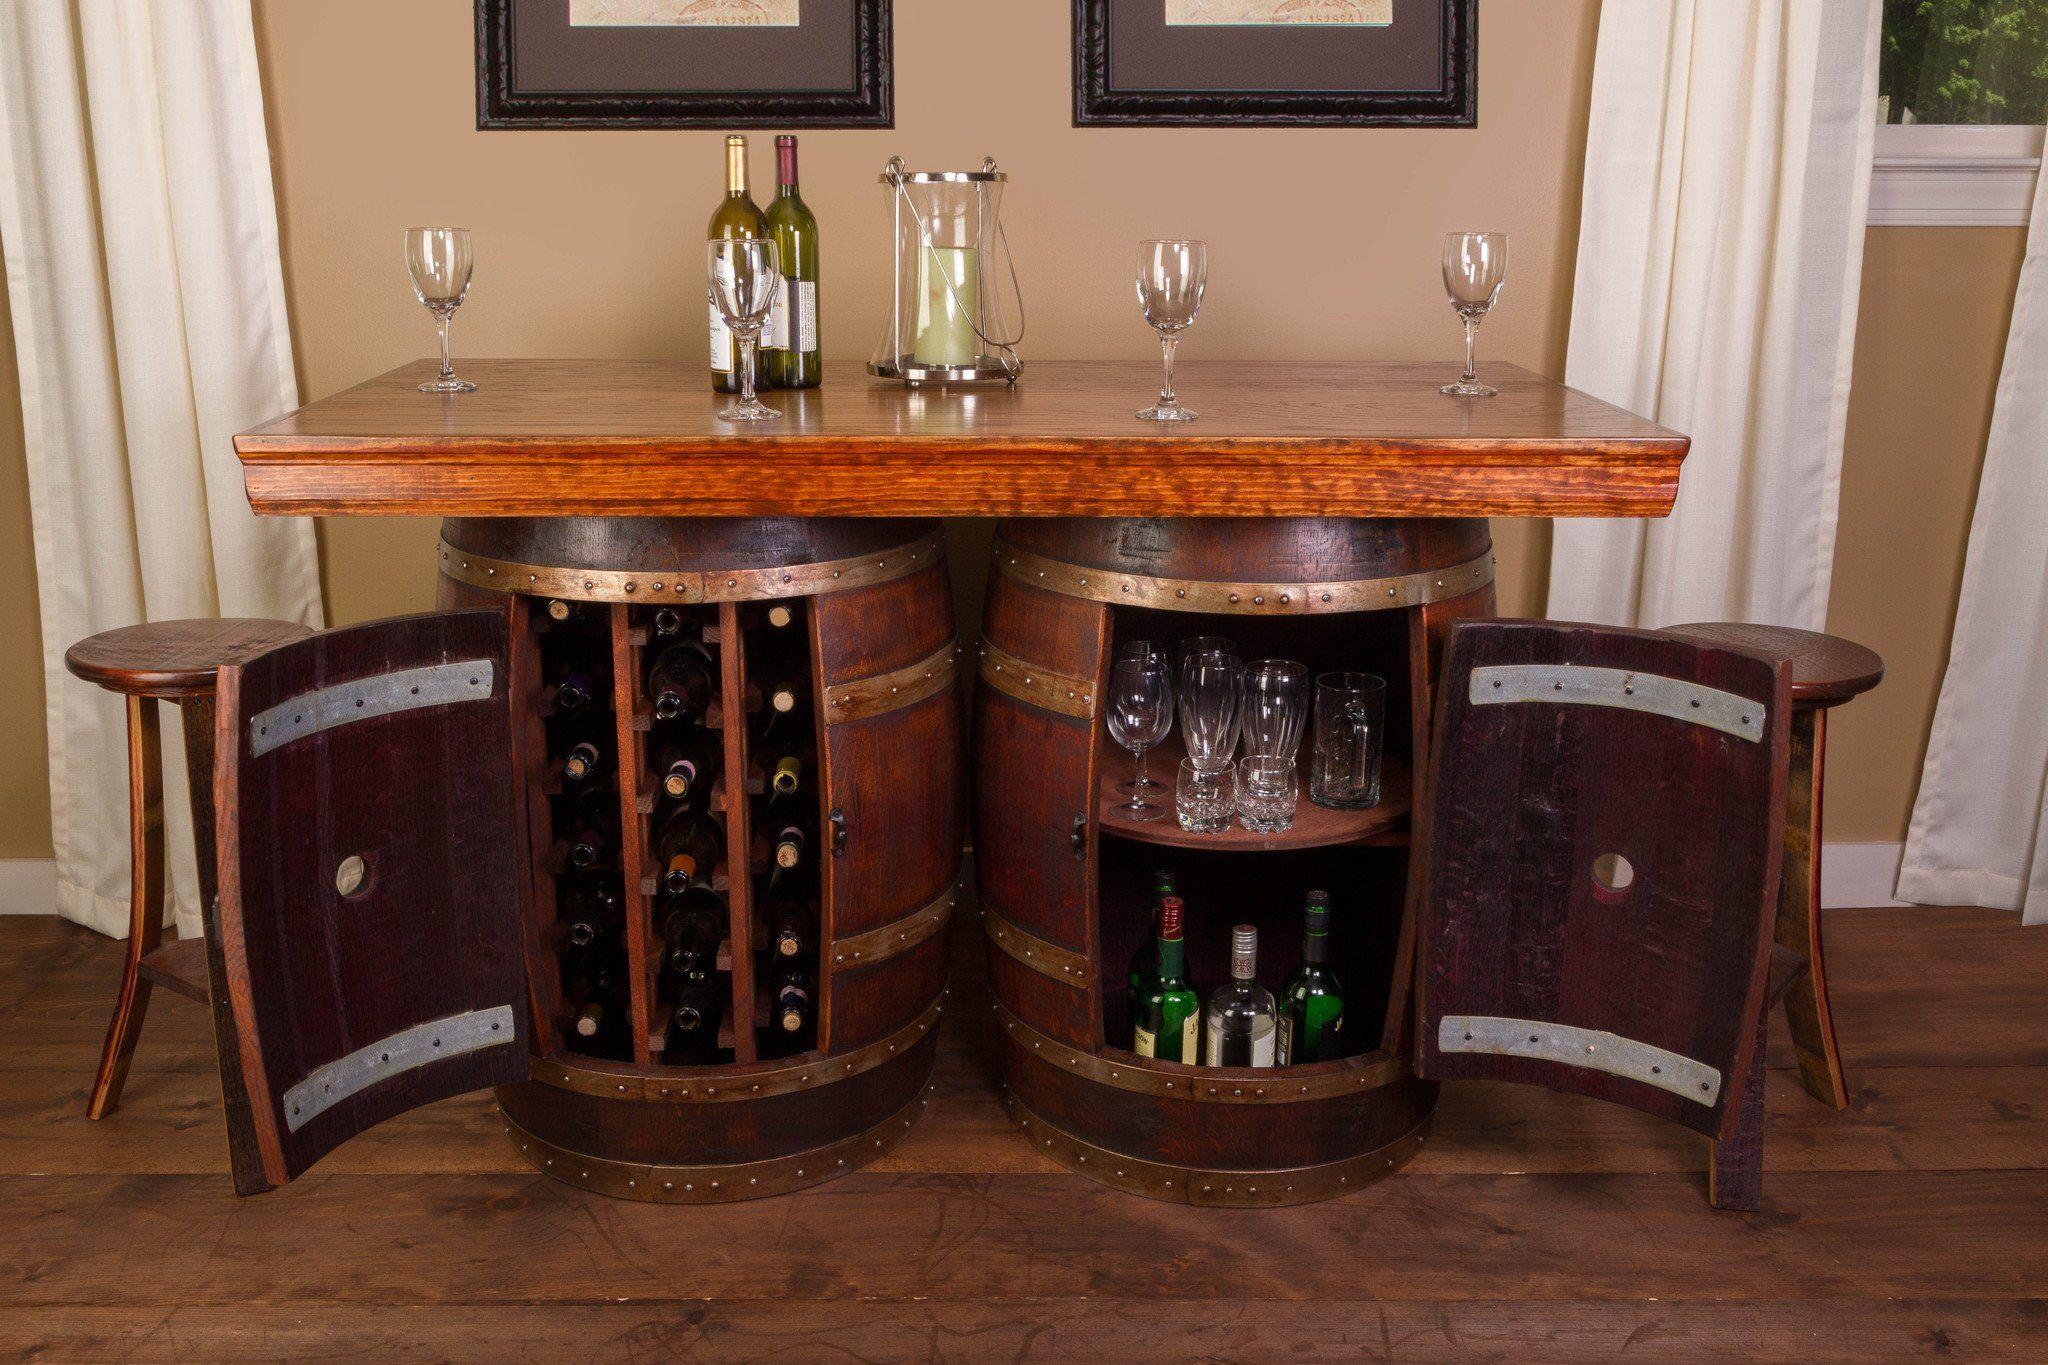 Wine Barrel Bar/Island Set with 4 Stools | Bar und Ideen